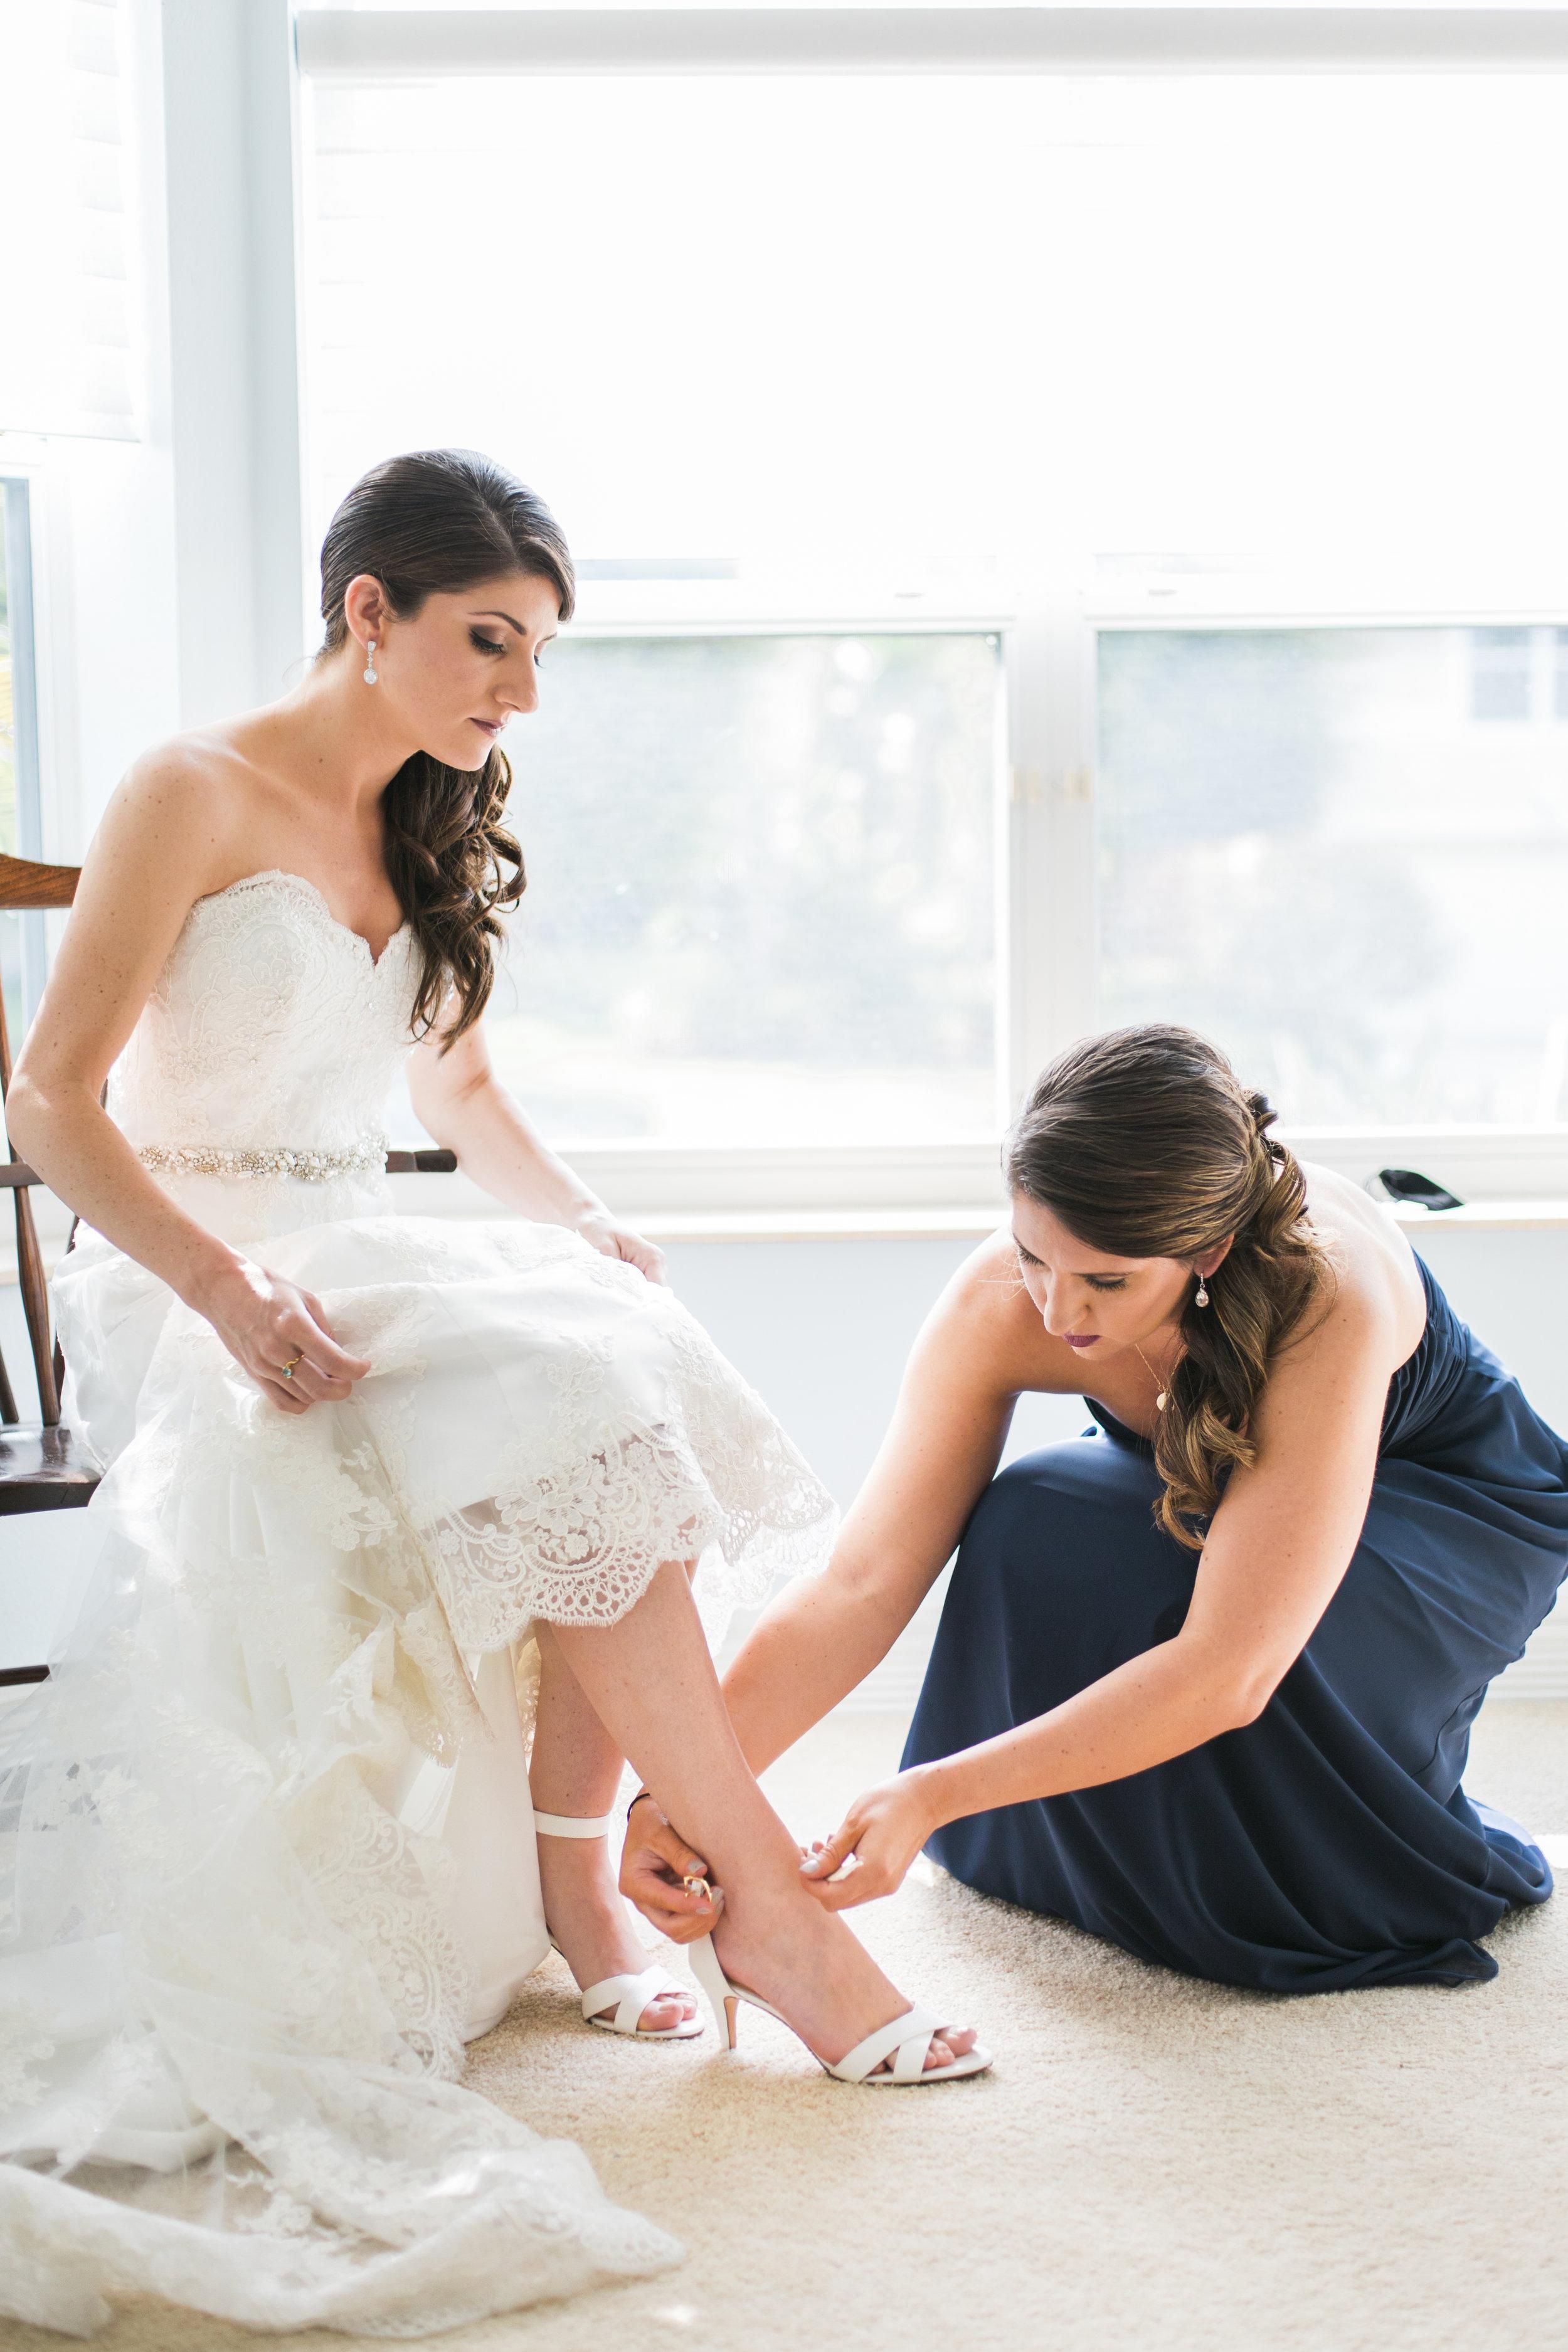 Rachel + Cole - Sarasota Wedding Photography - Charles Ringling Mansion Photographer